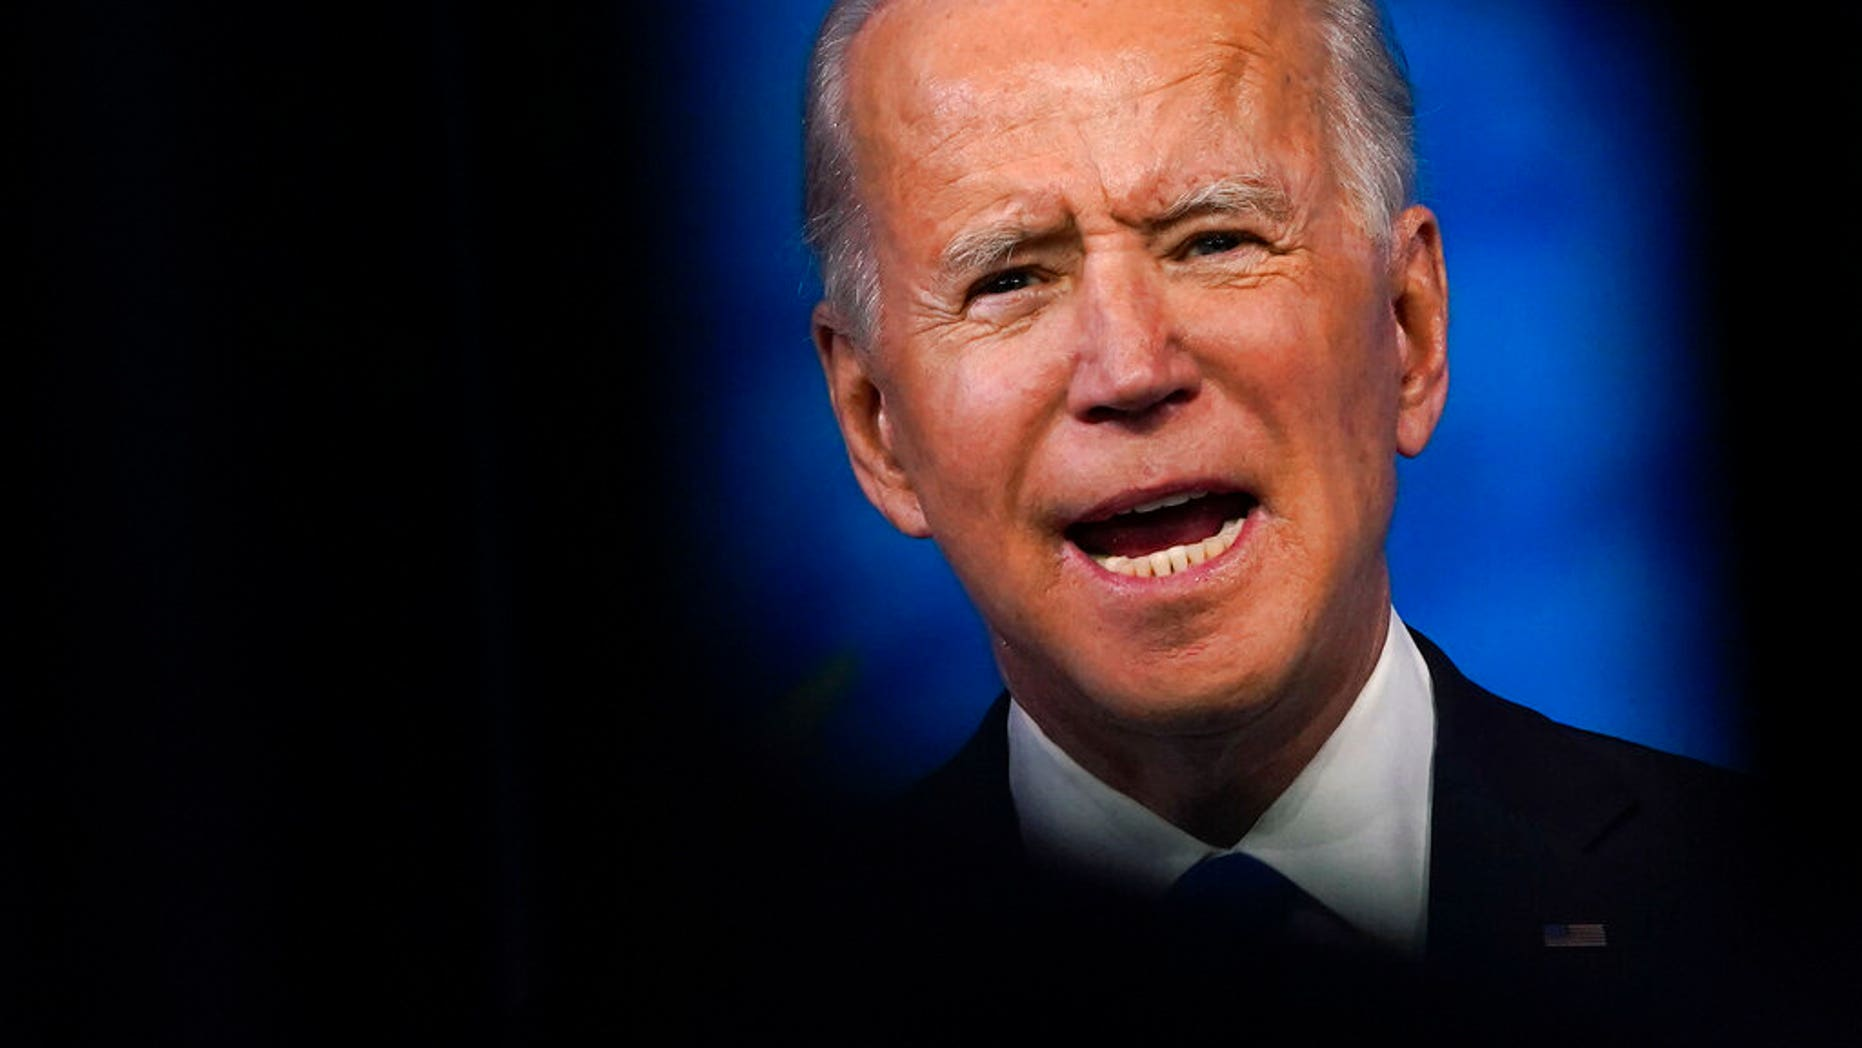 Joe Biden claims 'foul play' while defending son Hunter amid tax probe